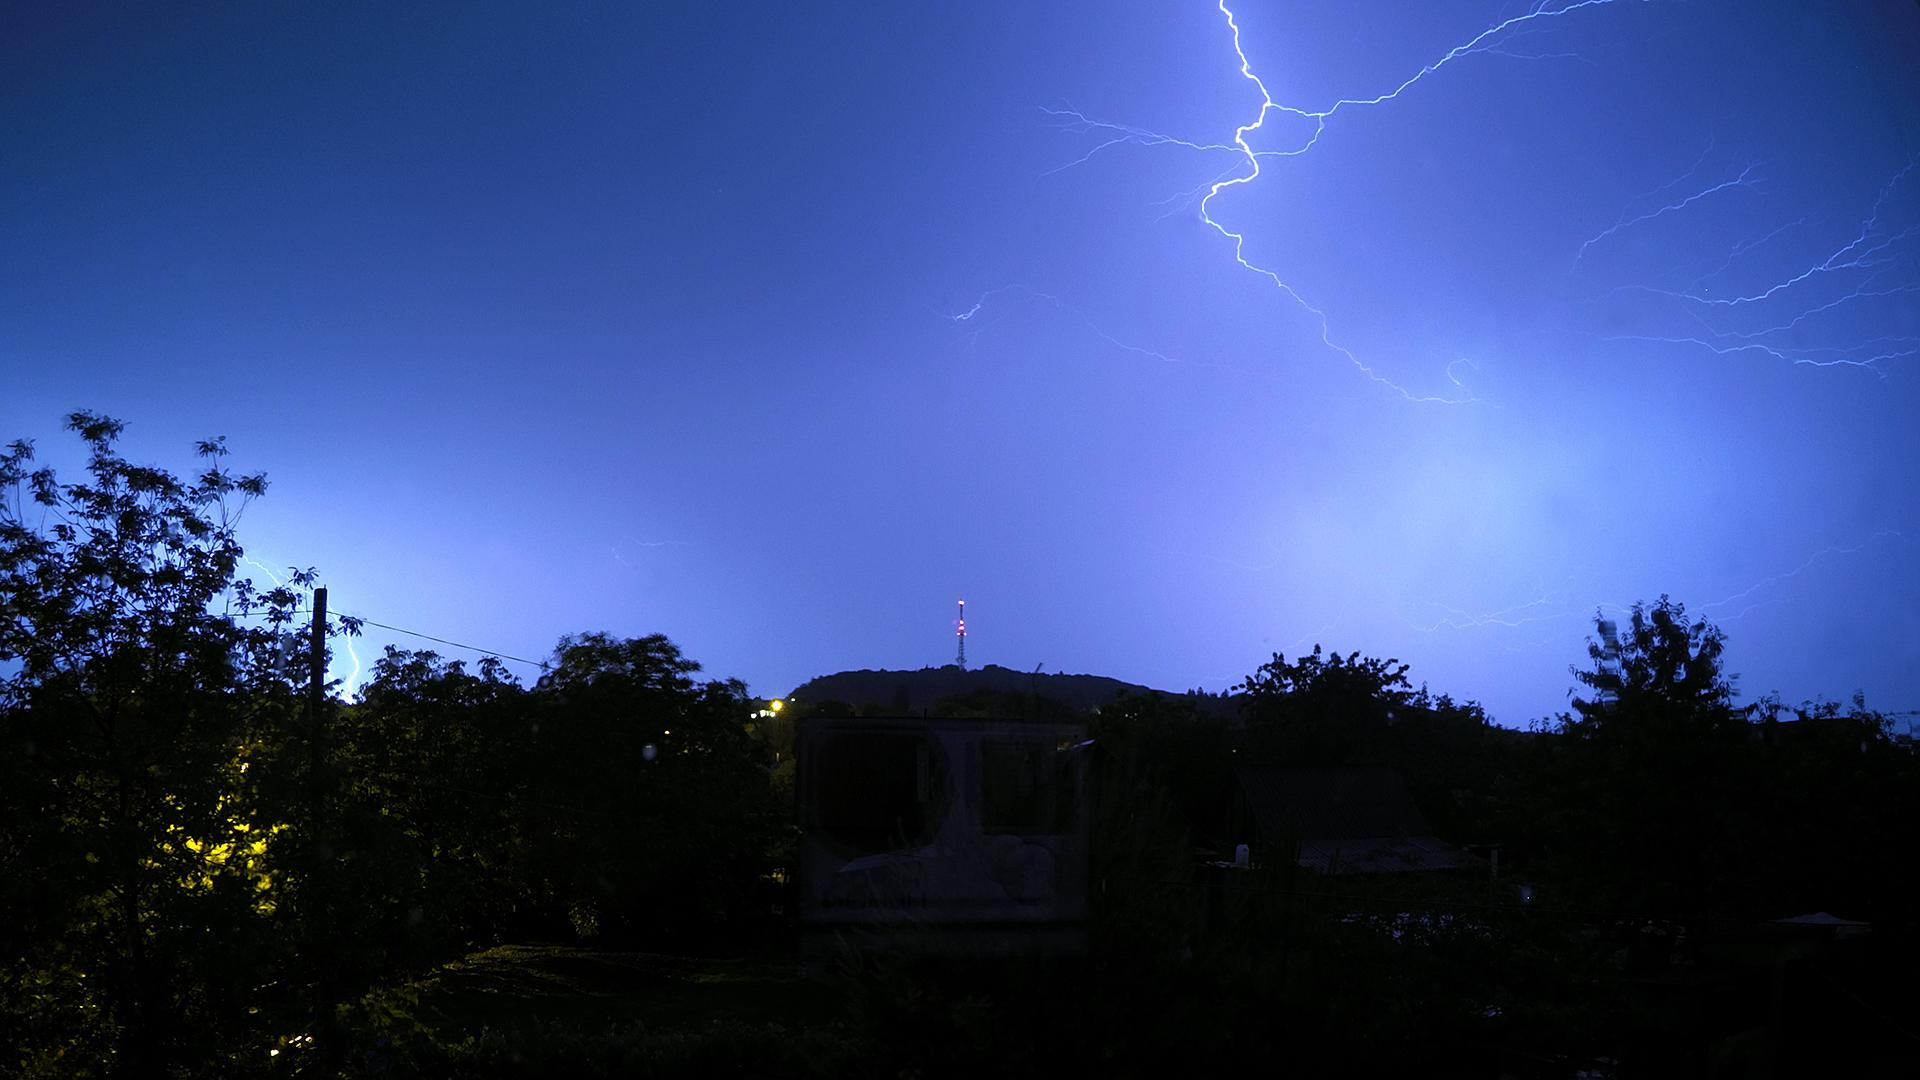 General 1920x1080 lightning night sky tower radio tower hills Ukraine trees nature storm